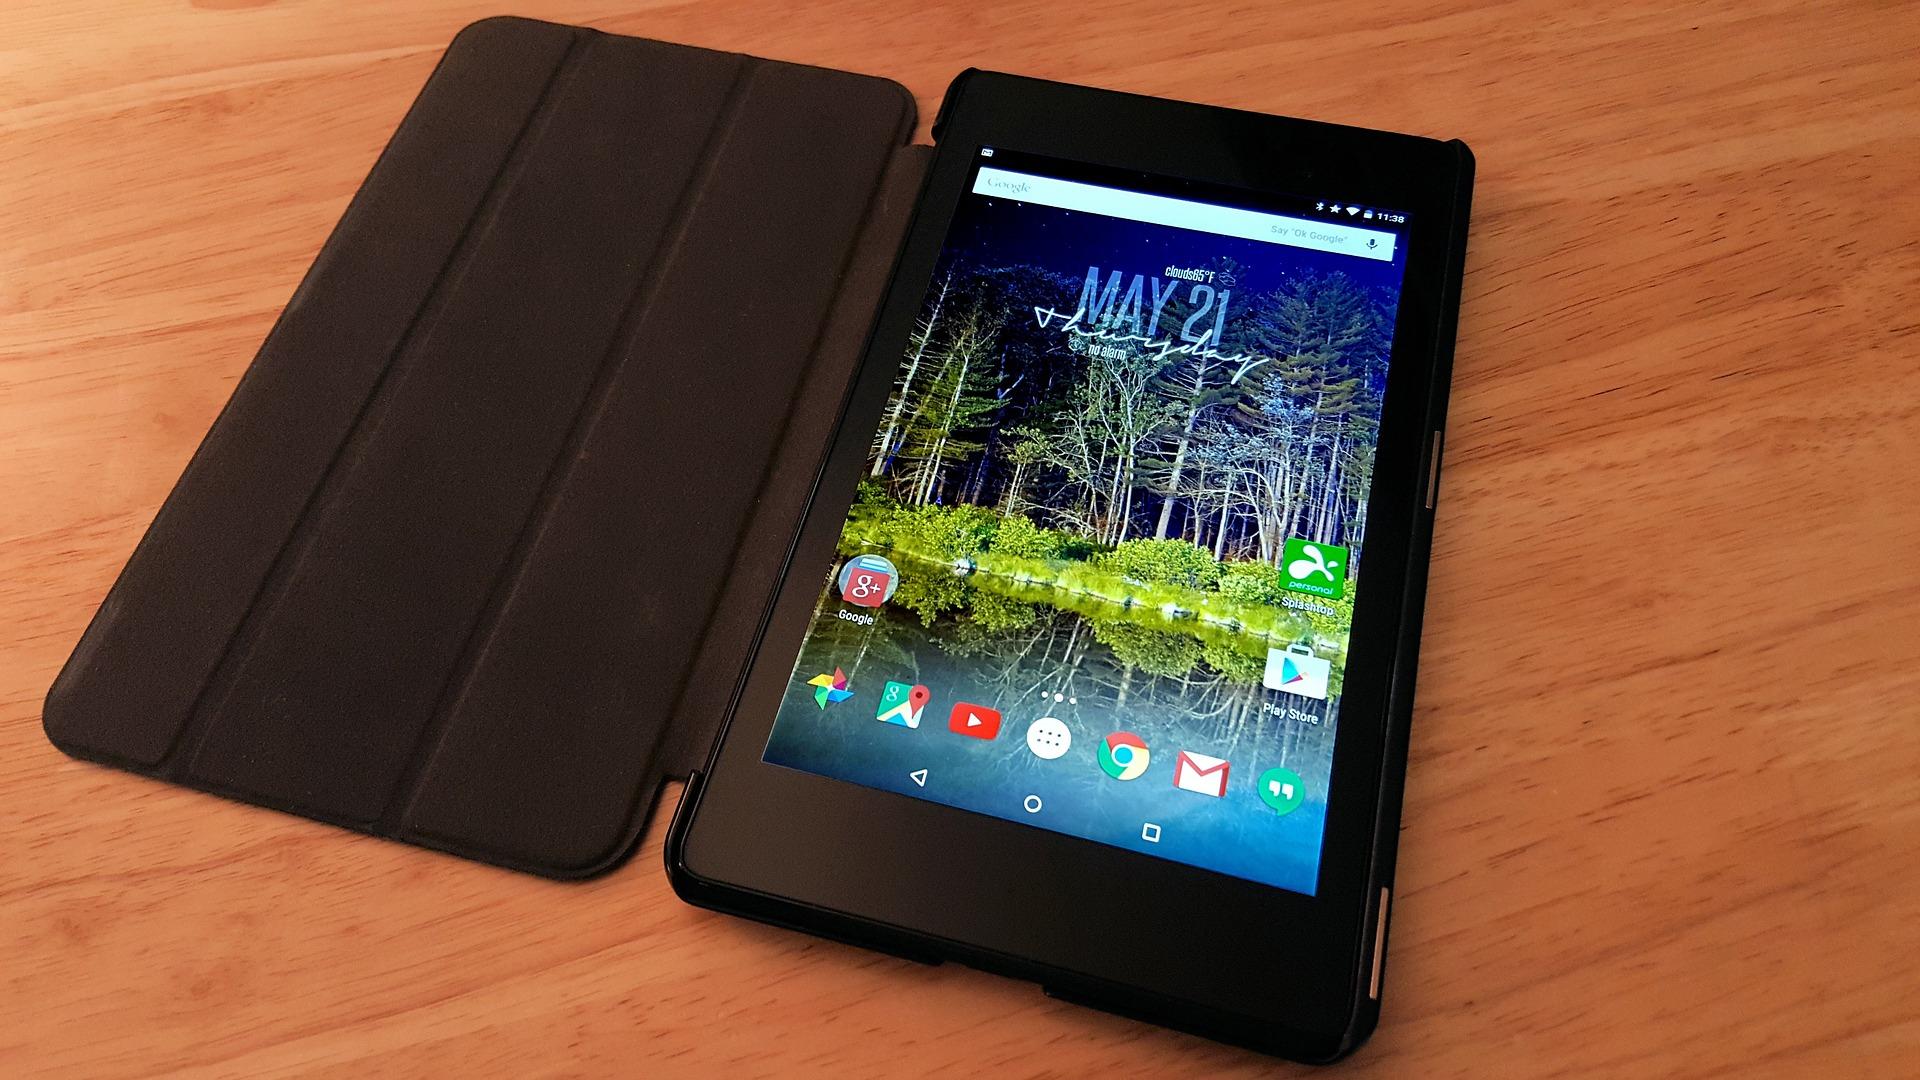 Tablet in black case